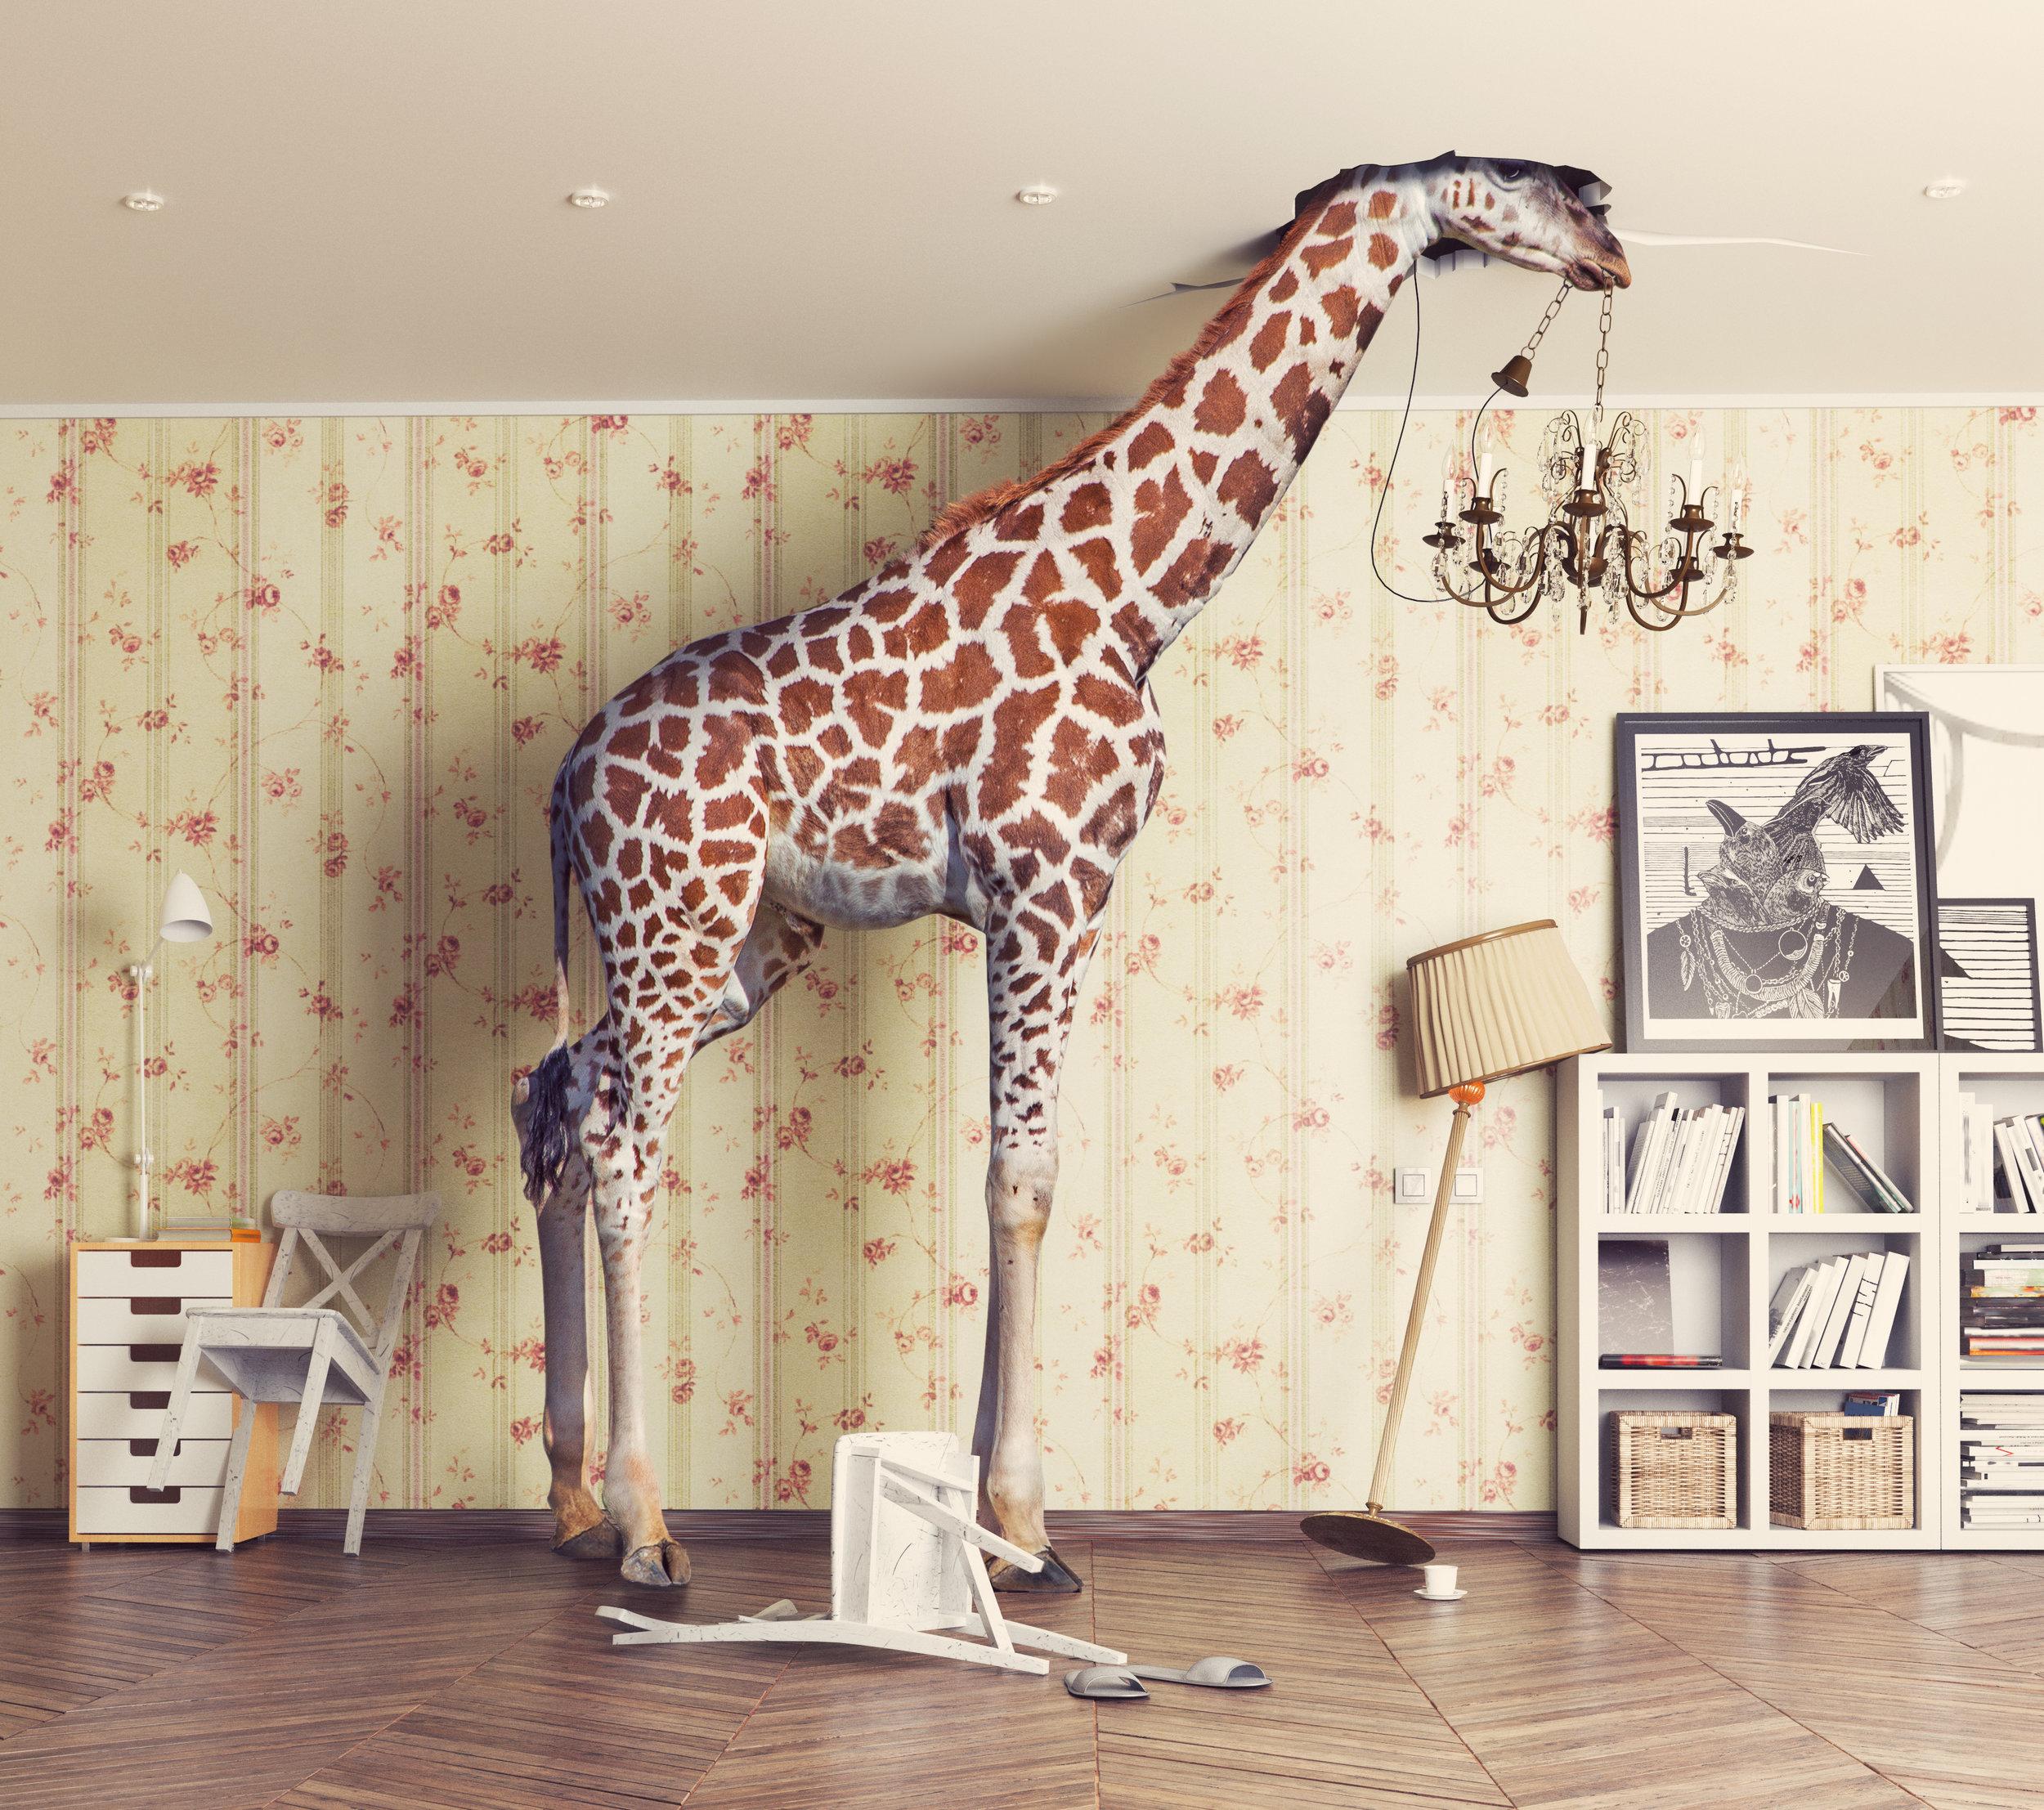 Dollar Giraffes - Live Music from 2 pm to 6 pmSunday September 1st